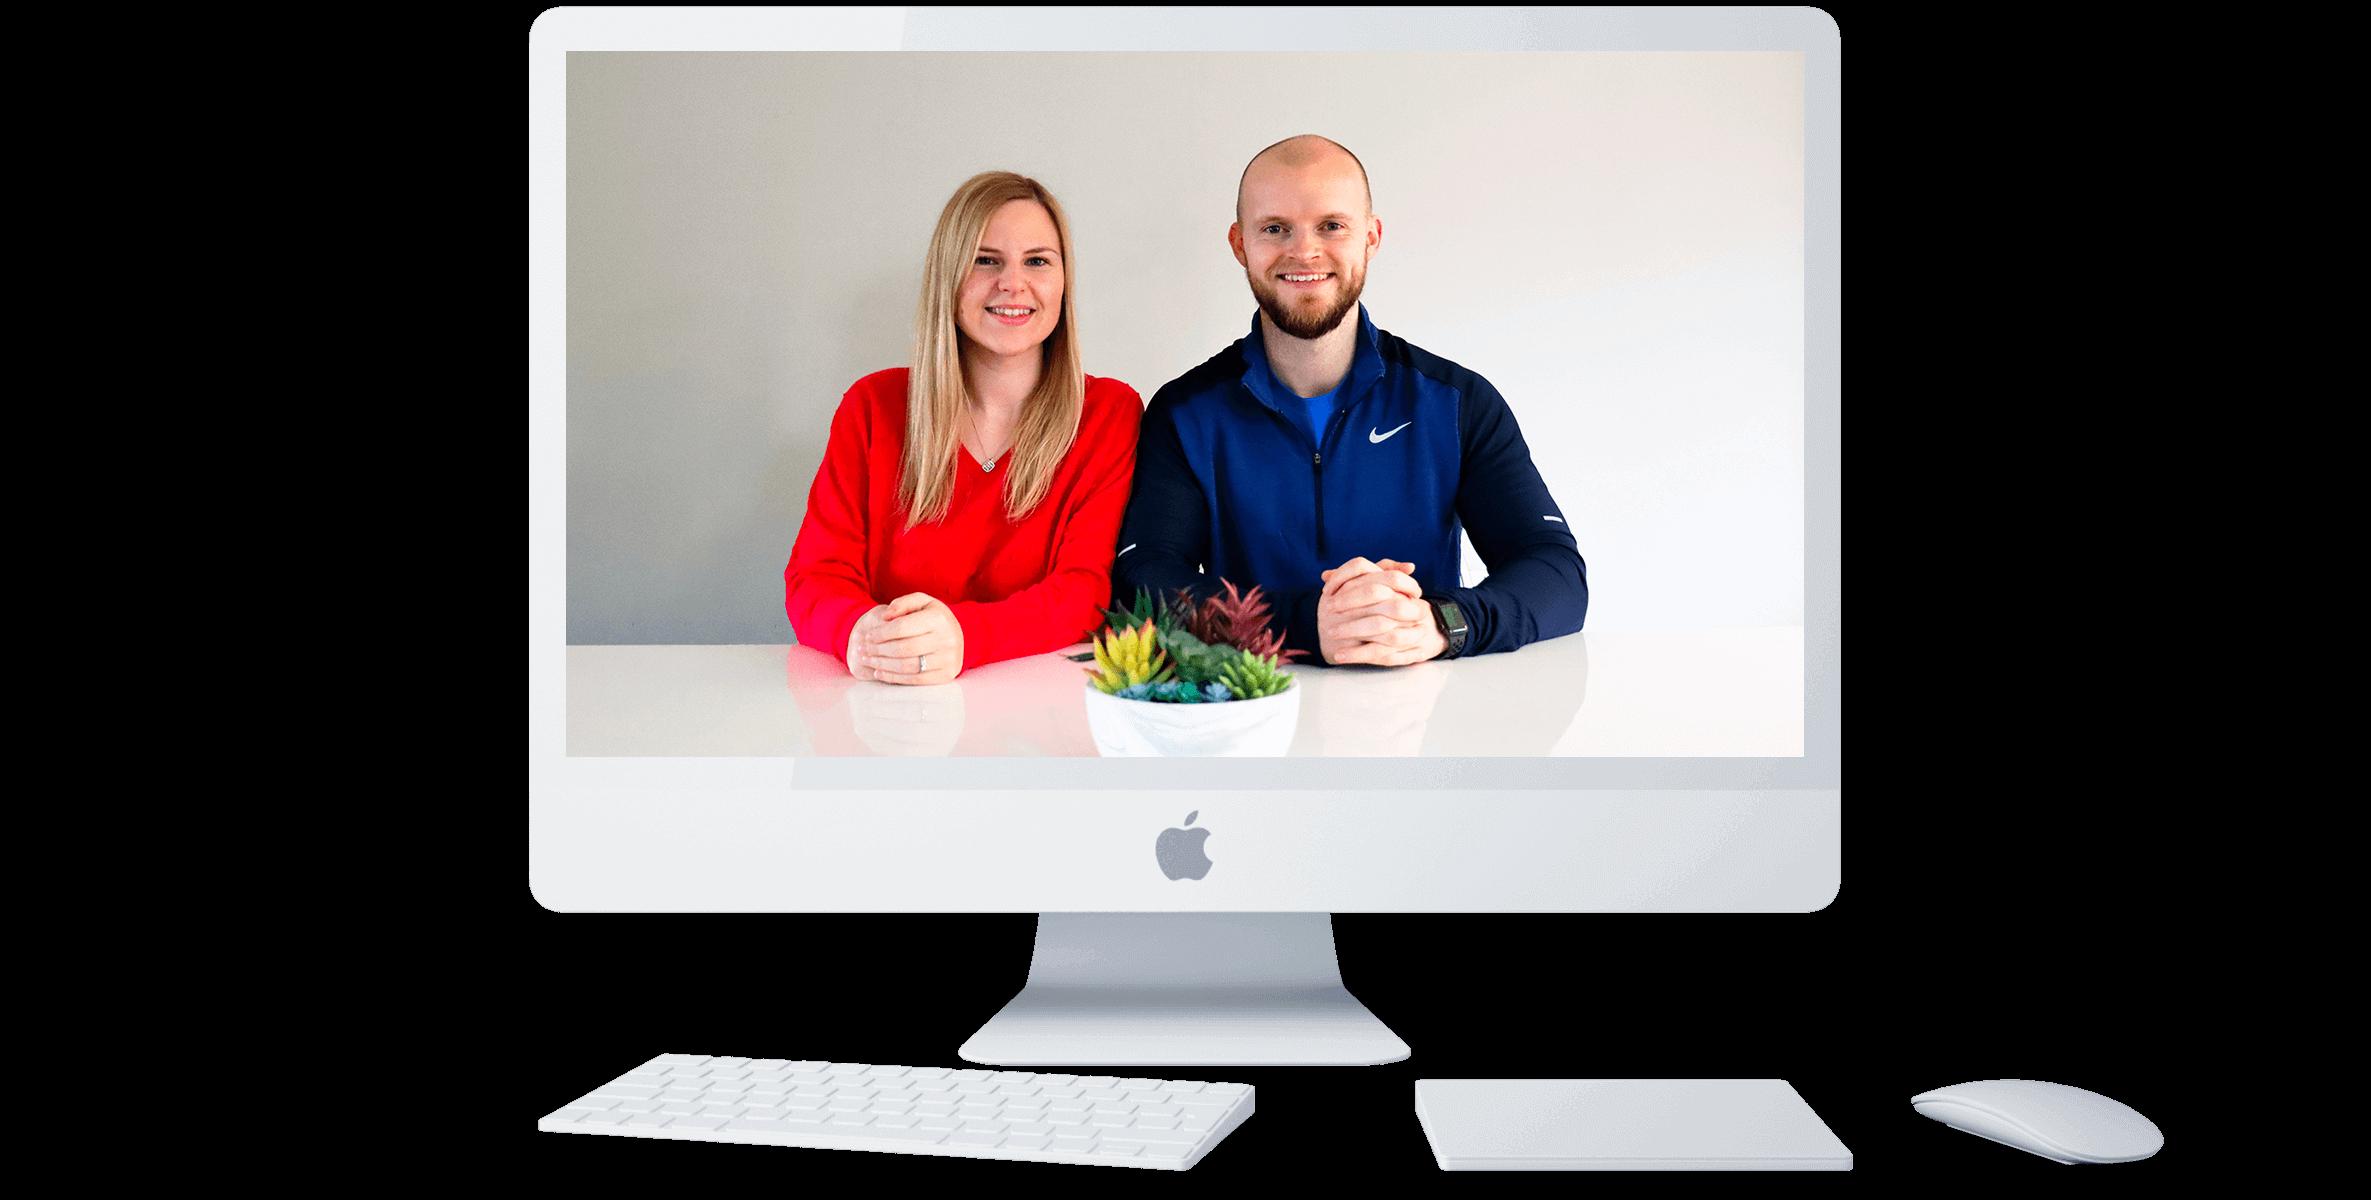 Steve and Stephanie Ashcroft founders of Fruity Llama Designs.